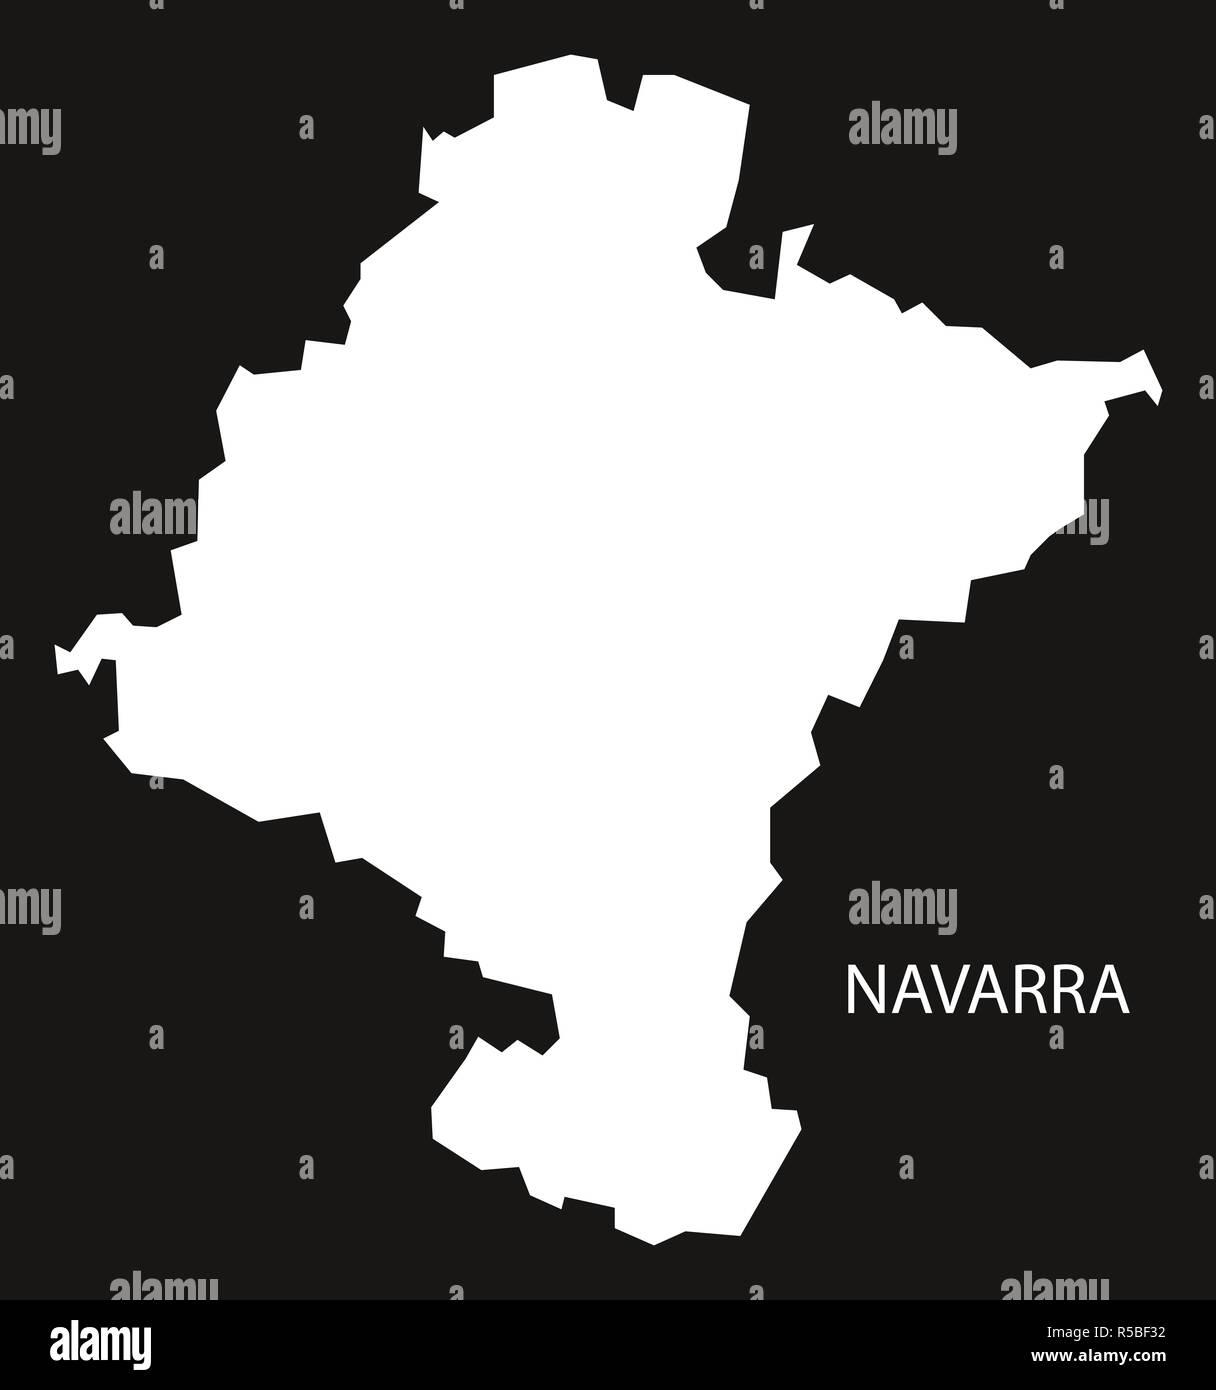 Navarra Spain Map Black Inverted Silhouette Illustration Stock Photo